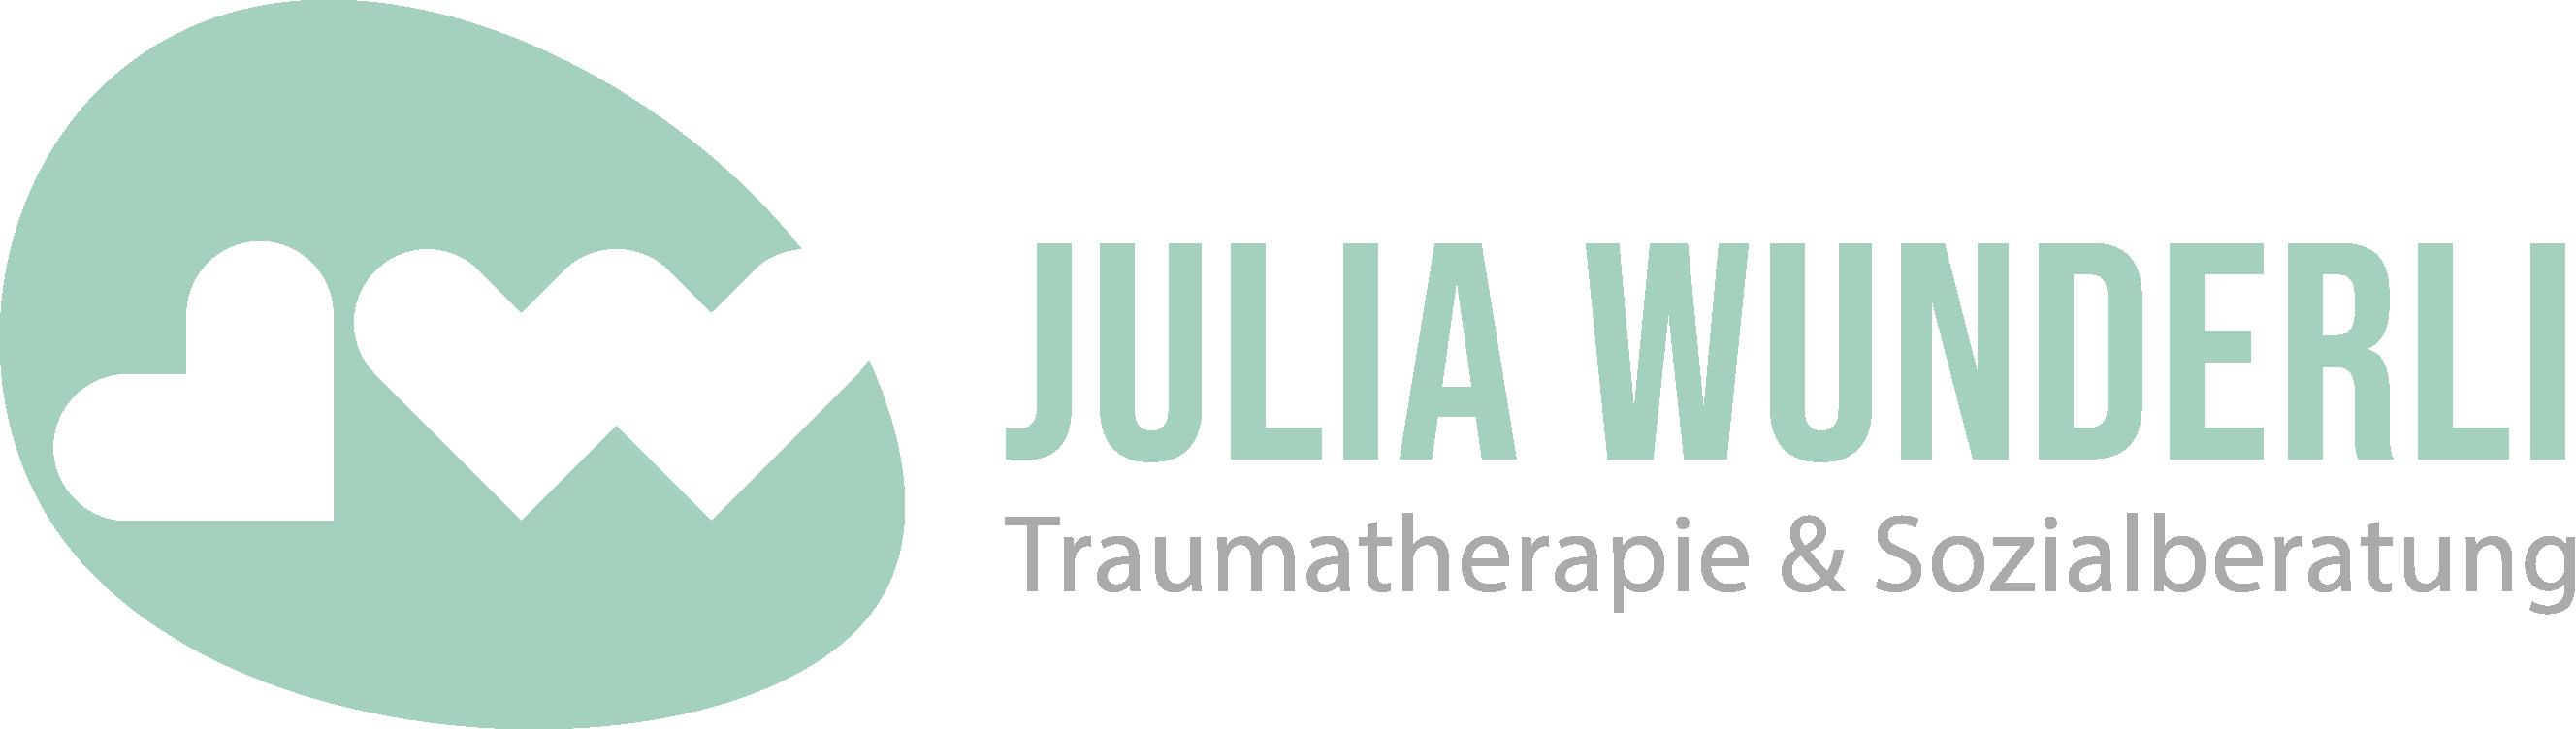 Julia Wunderli - Traumatherapie & Sozialberatung